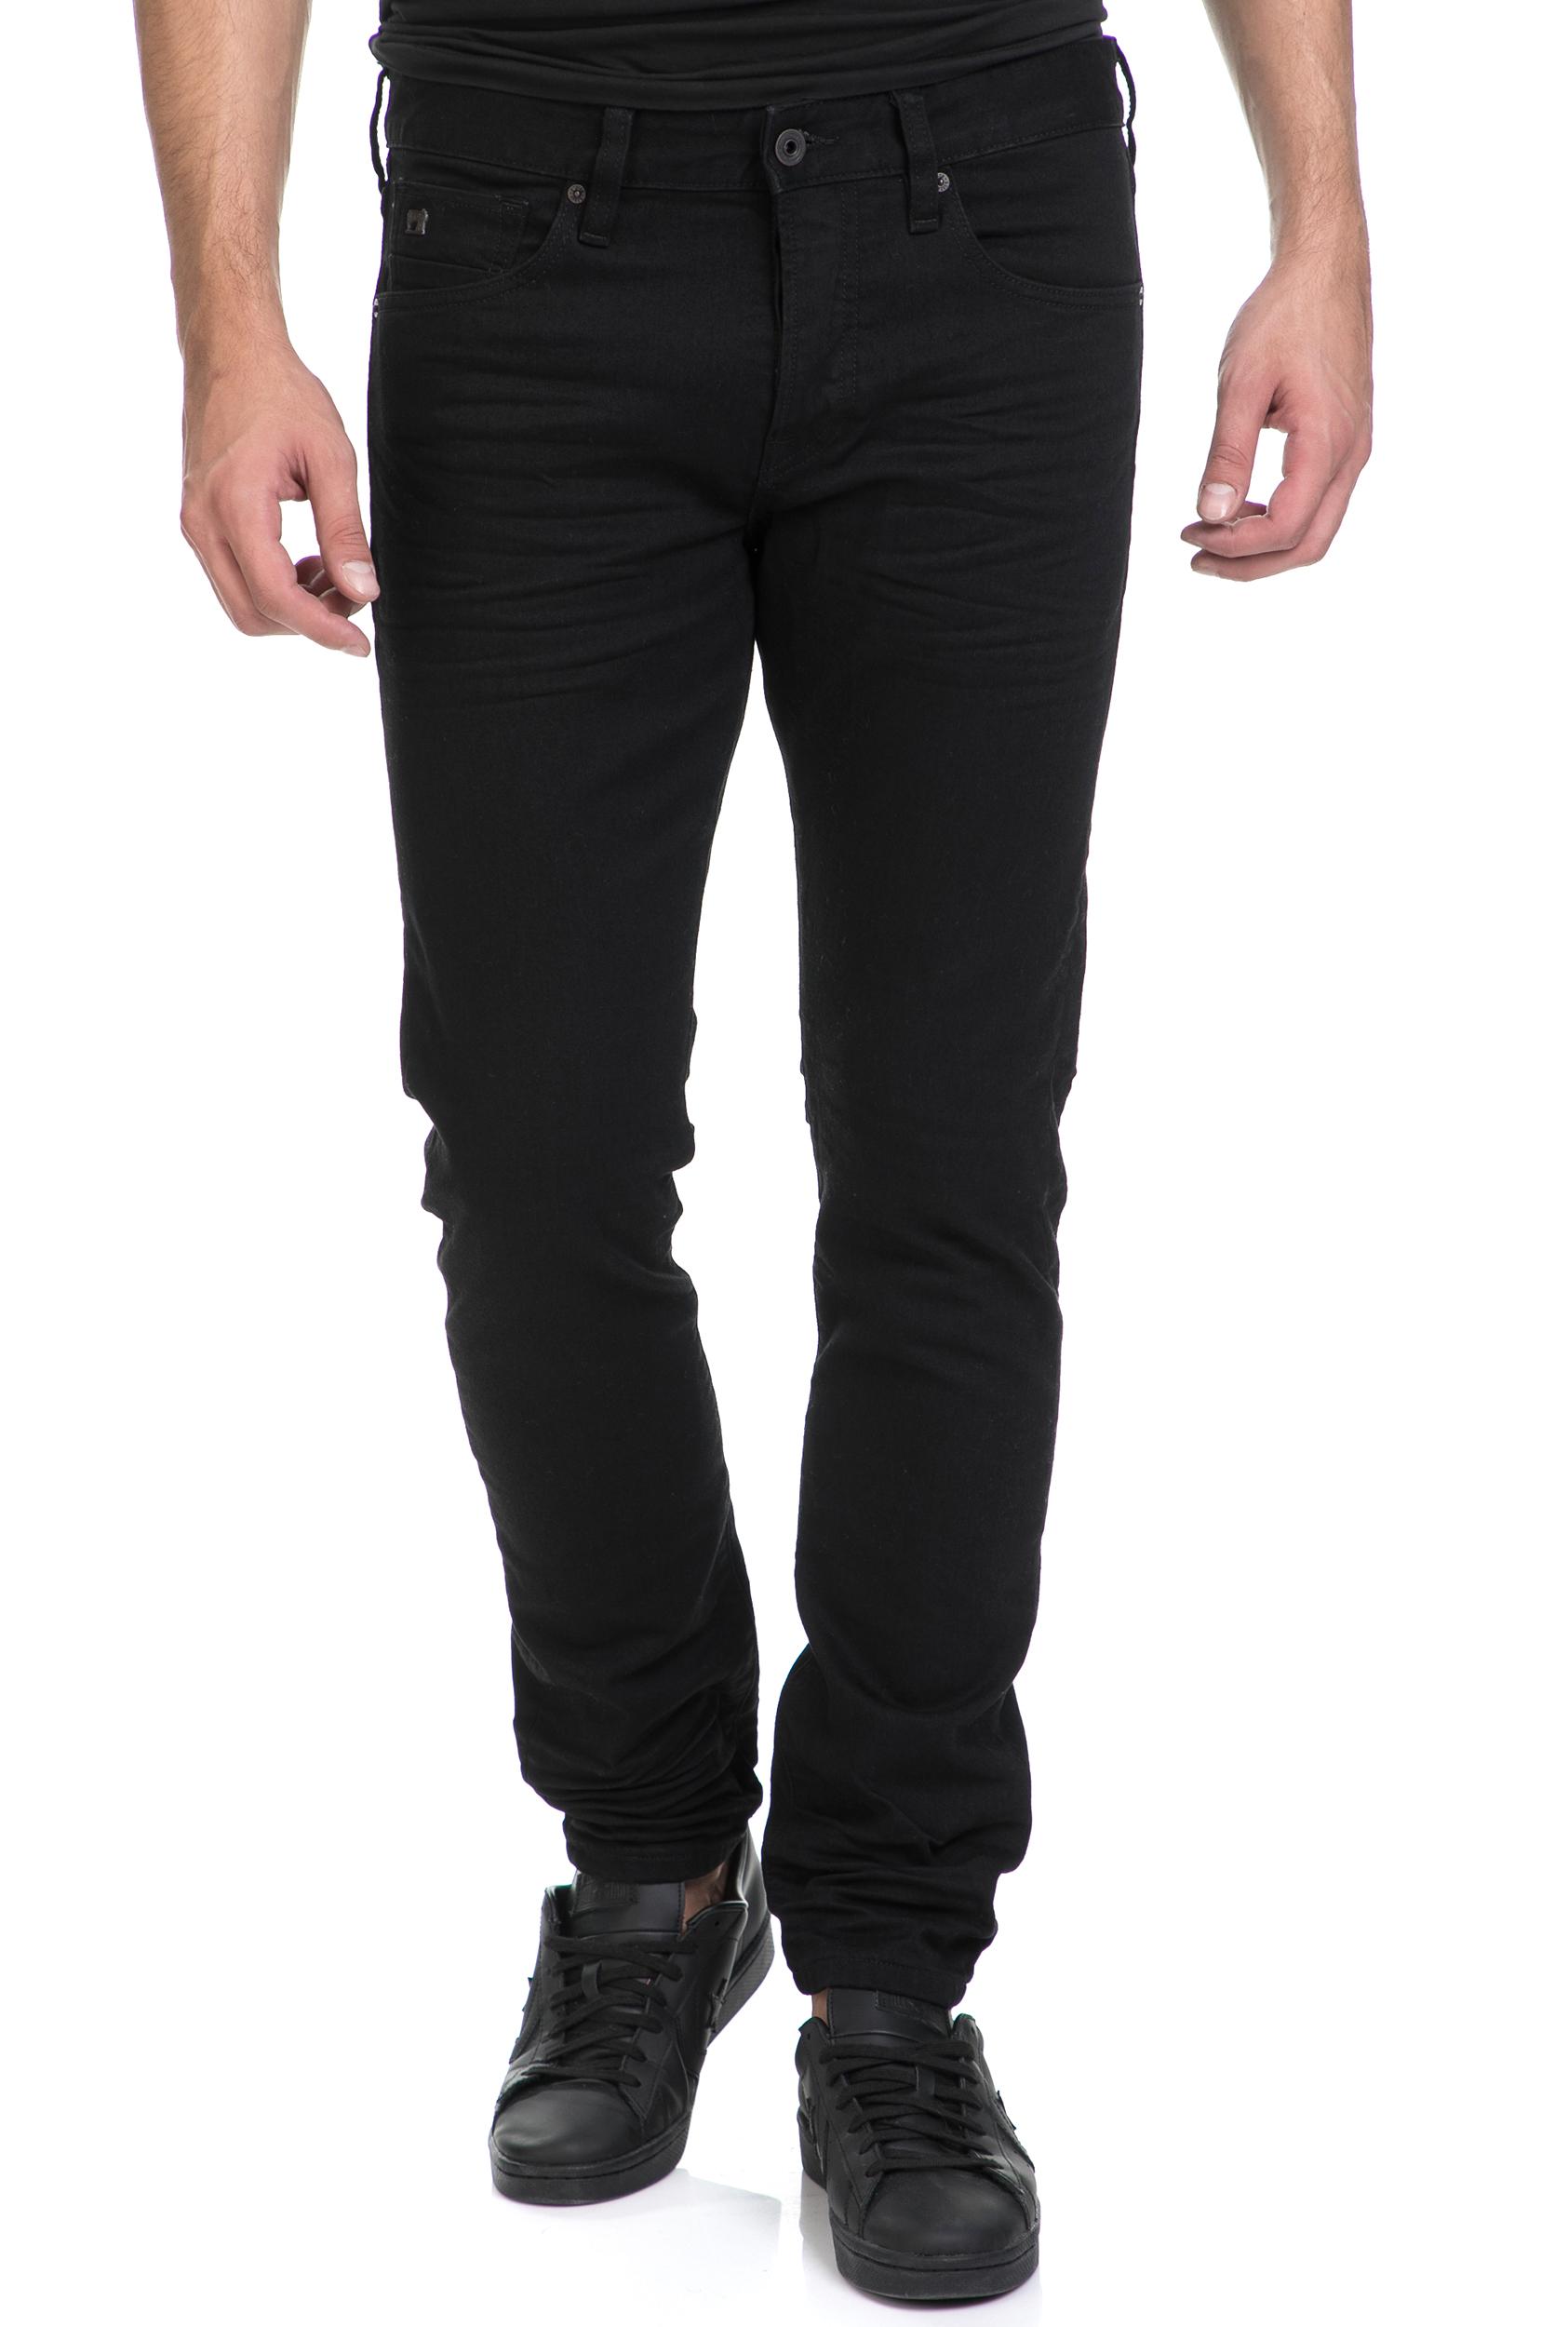 SCOTCH & SODA - Ανδρικό παντελόνι Ralston - Stay Black SCOTCH & SODA μαύρο ανδρικά ρούχα τζίν skinny